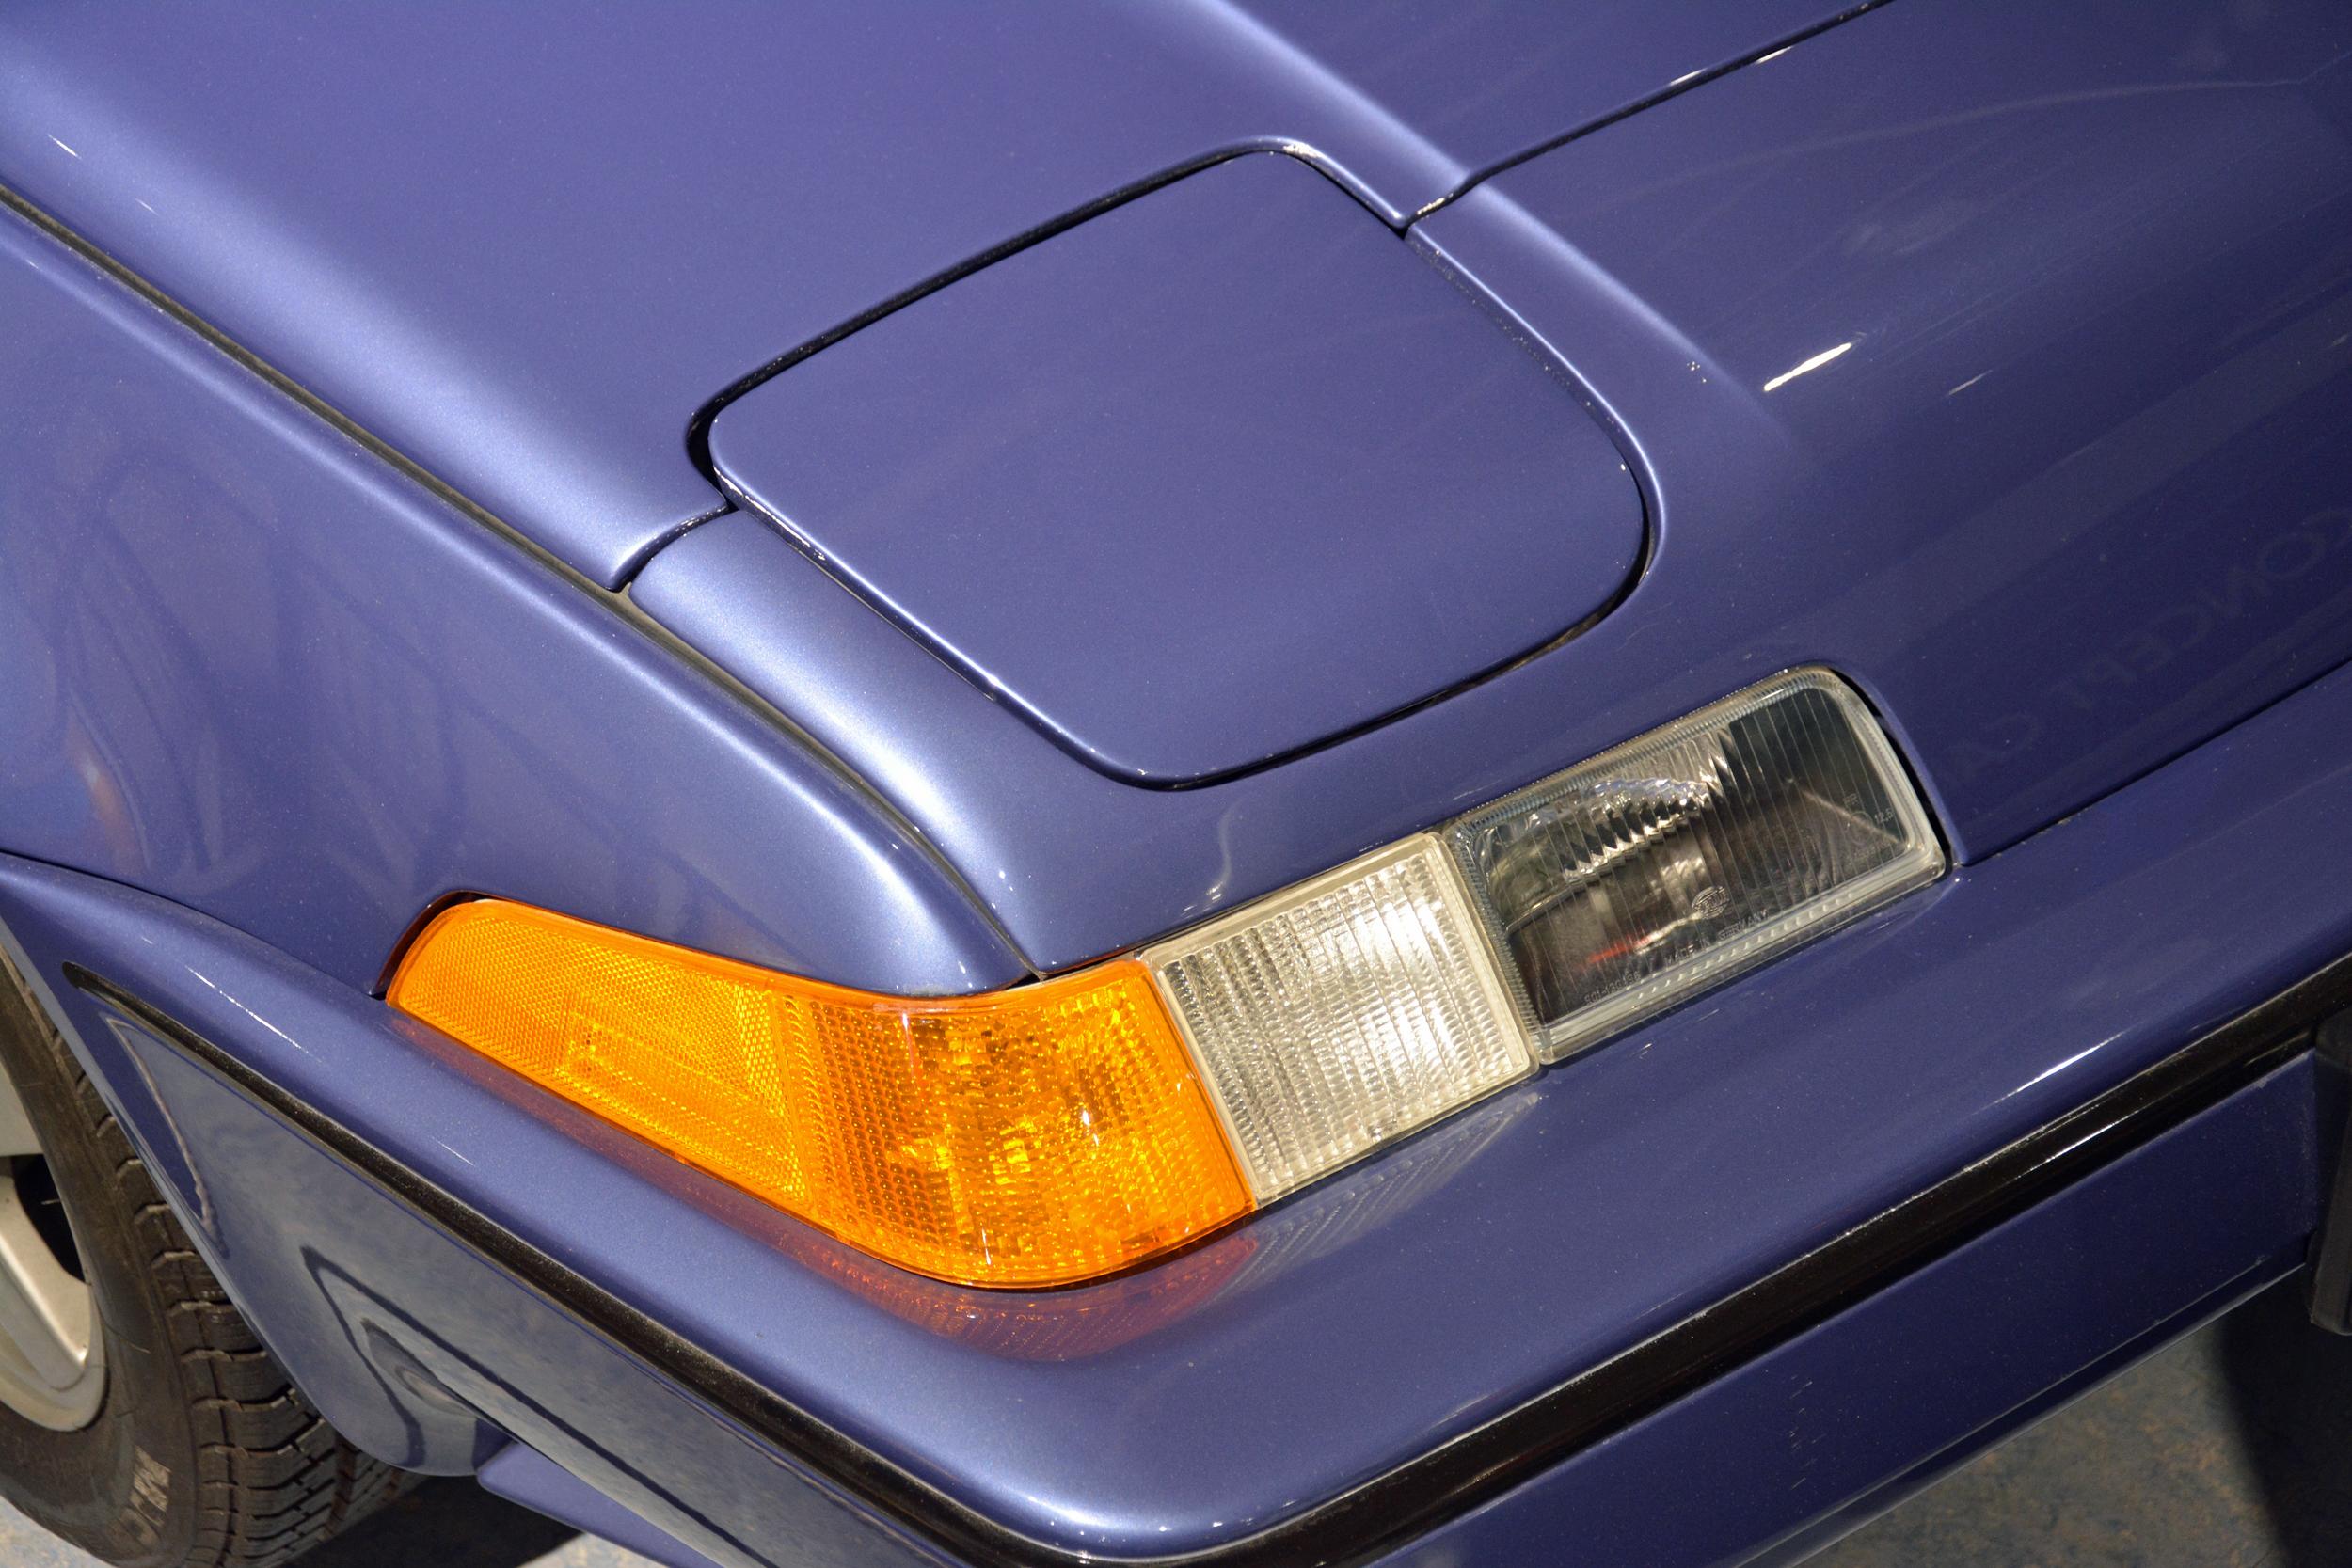 saab museum volvo 480 convertible turbo headlight detail